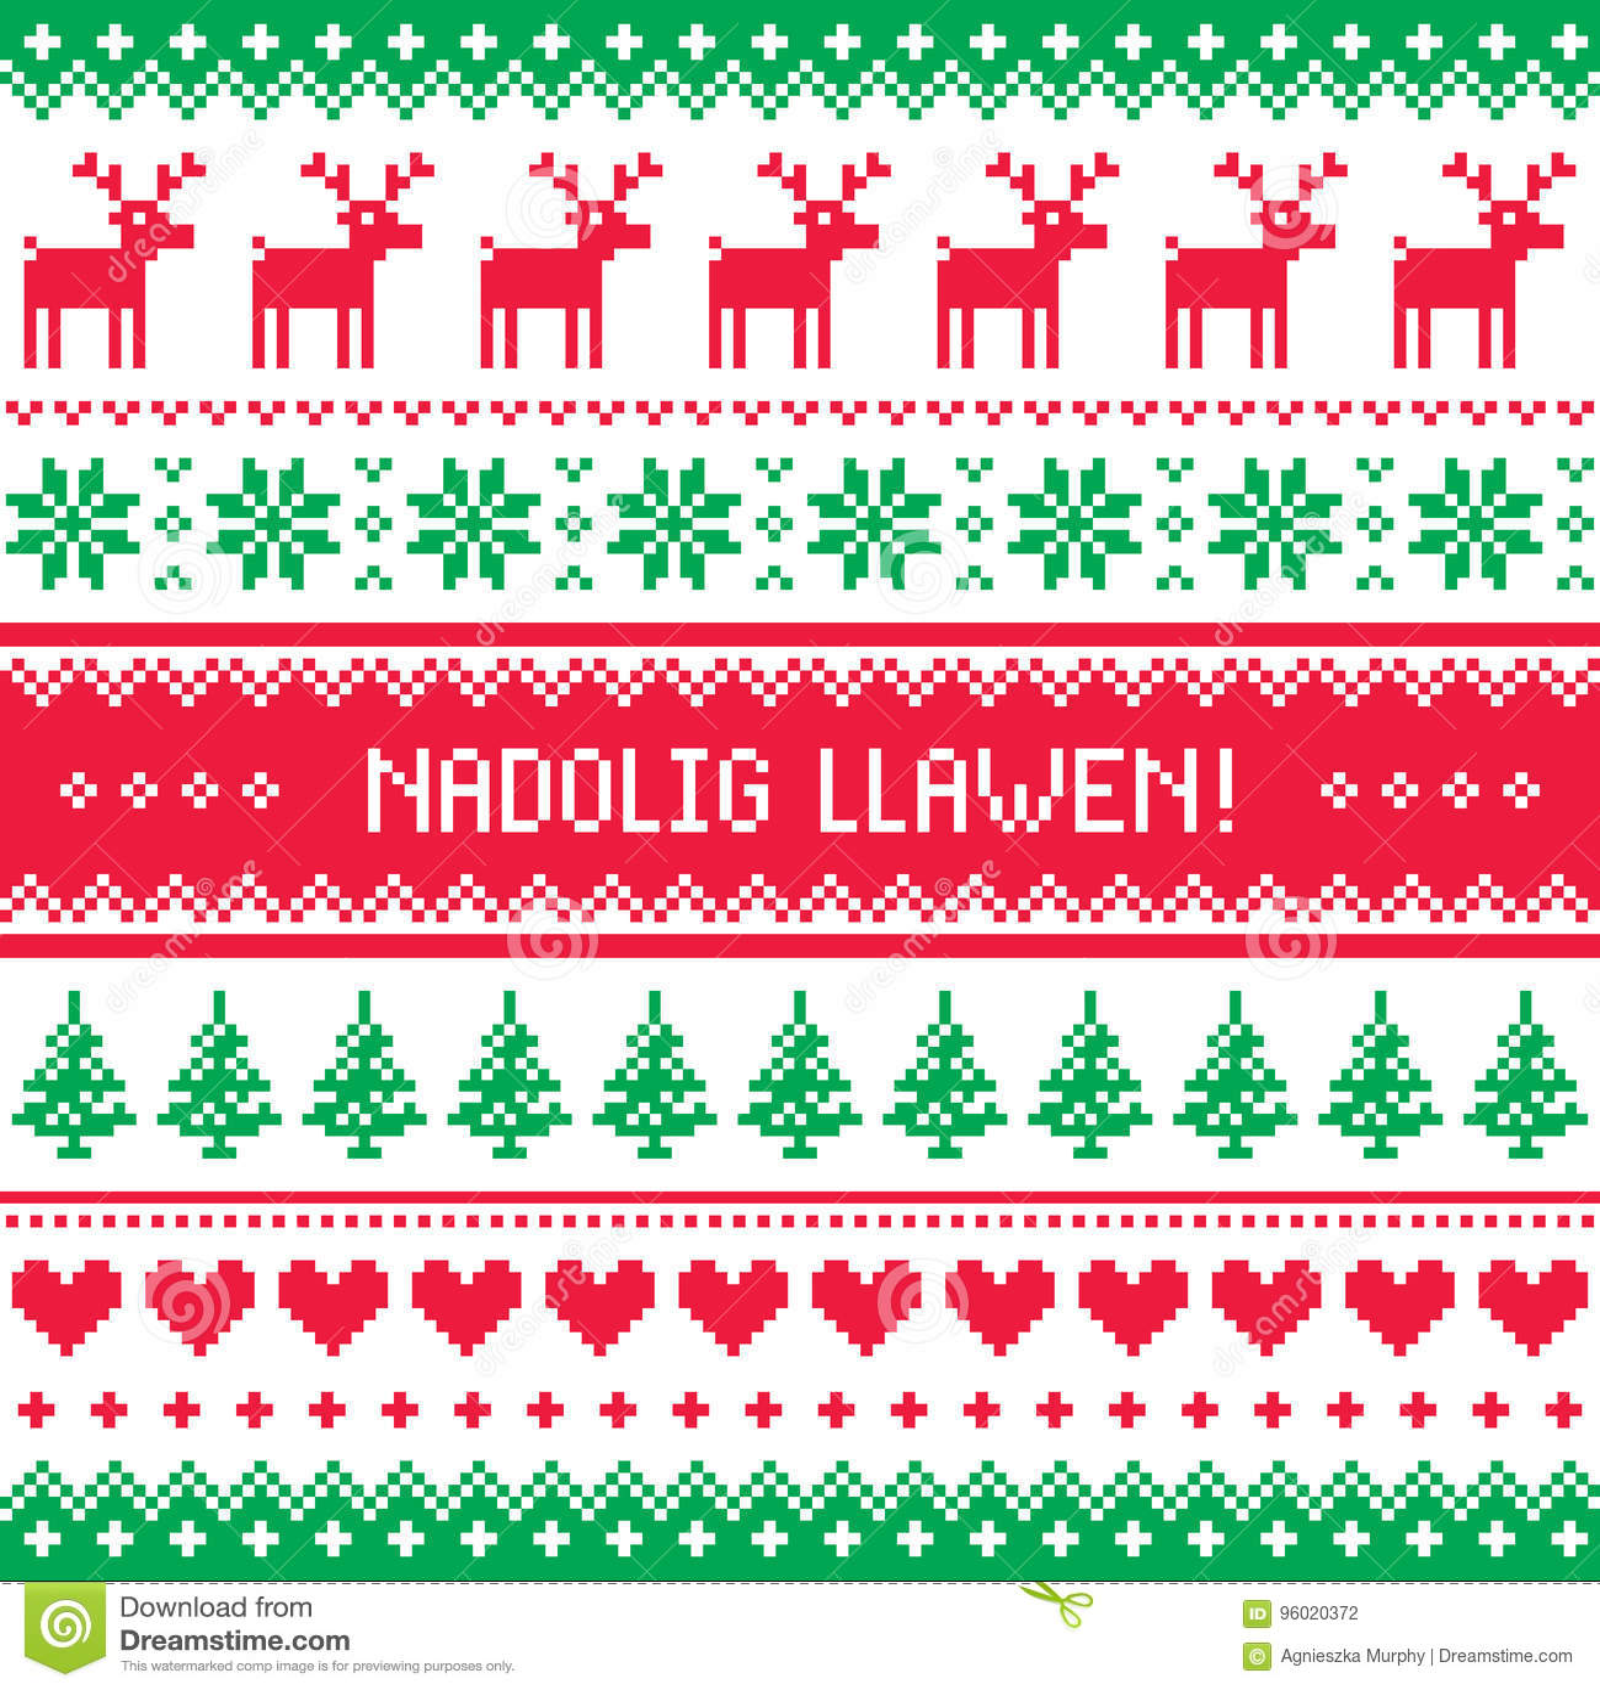 Nadolig llawen merry christmas in welsh greetings card seamless nadolig llawen merry christmas in welsh greetings card seamless pattern m4hsunfo